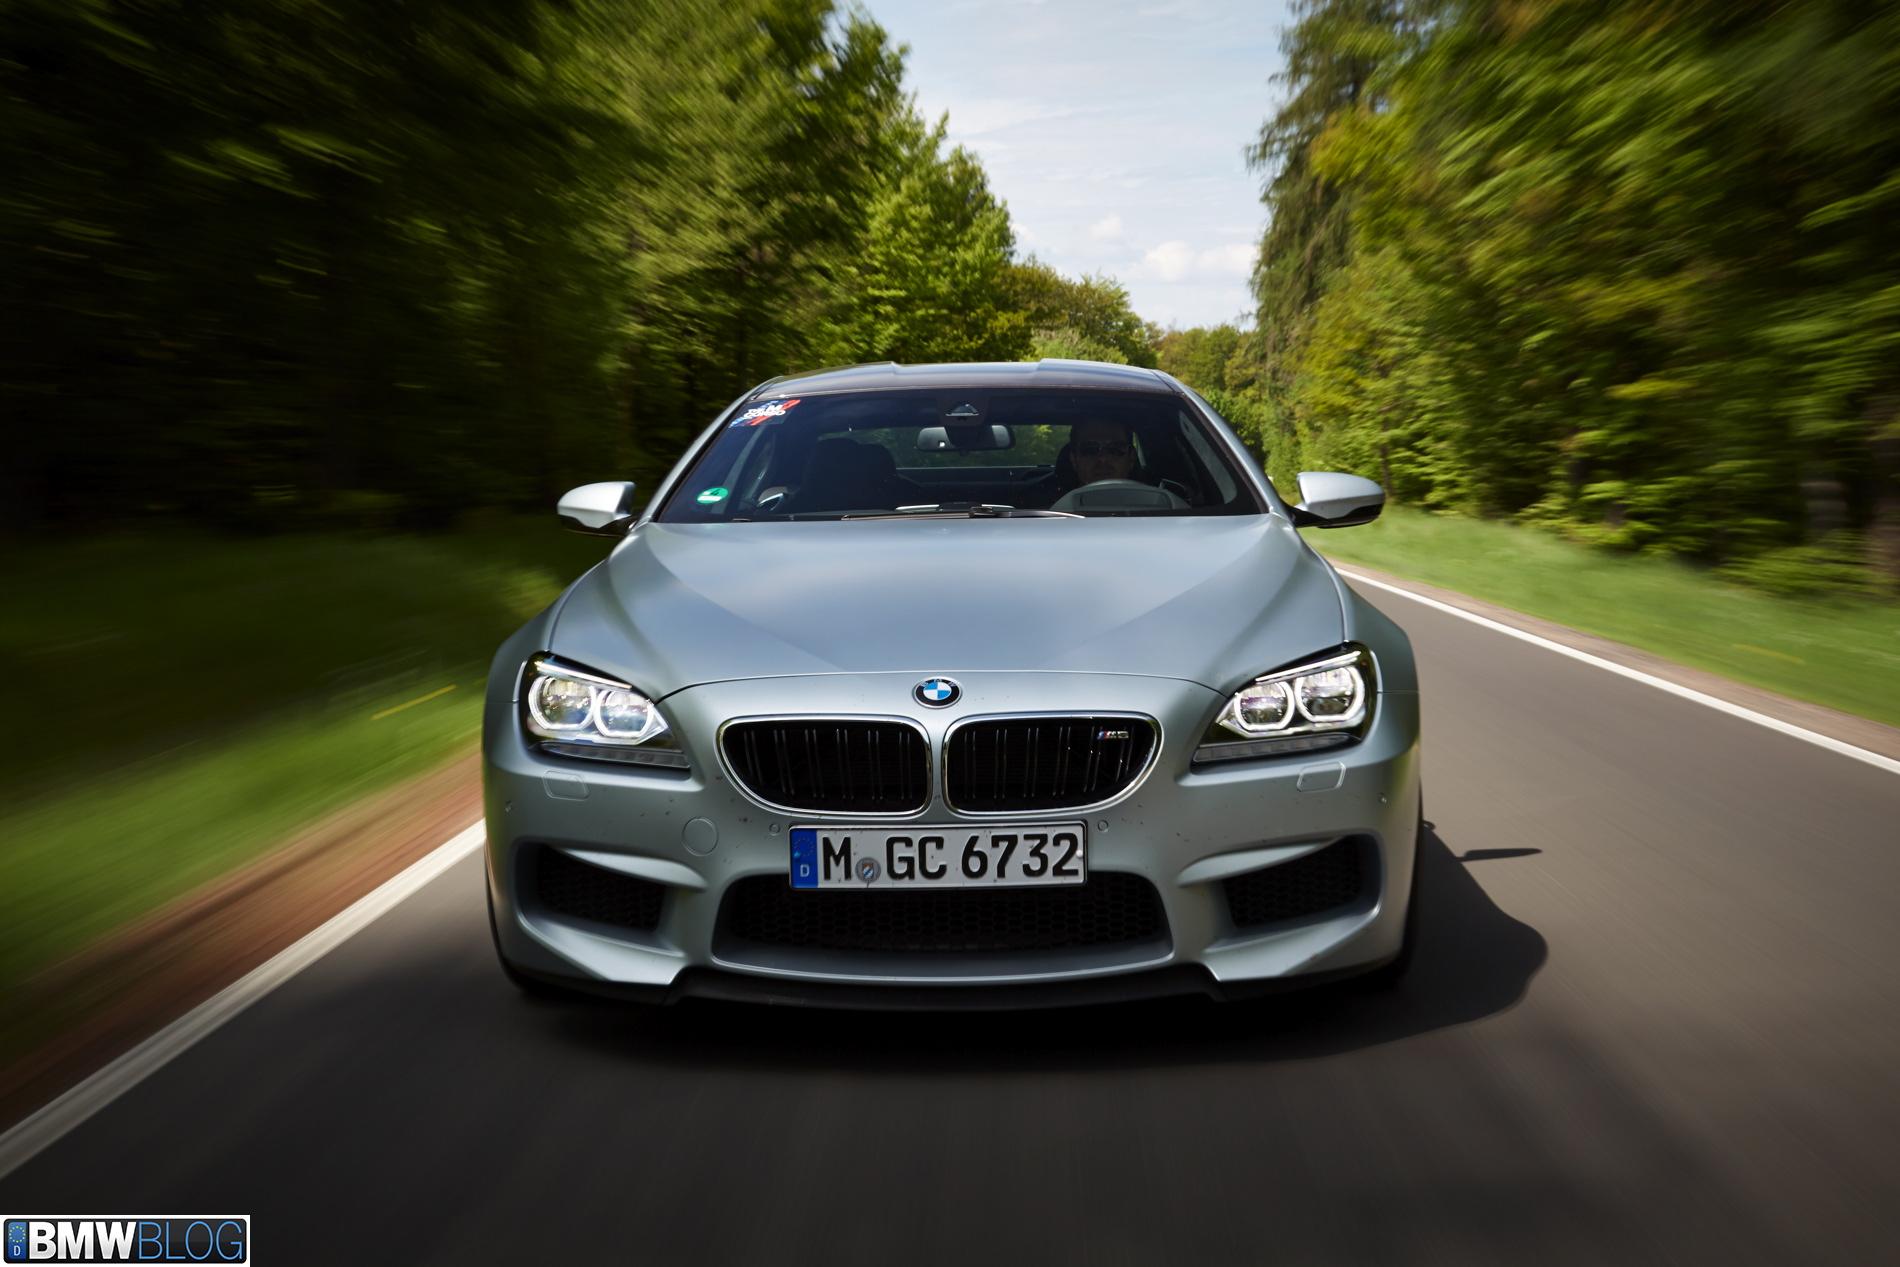 BMW m6 gran coupe test drive 06